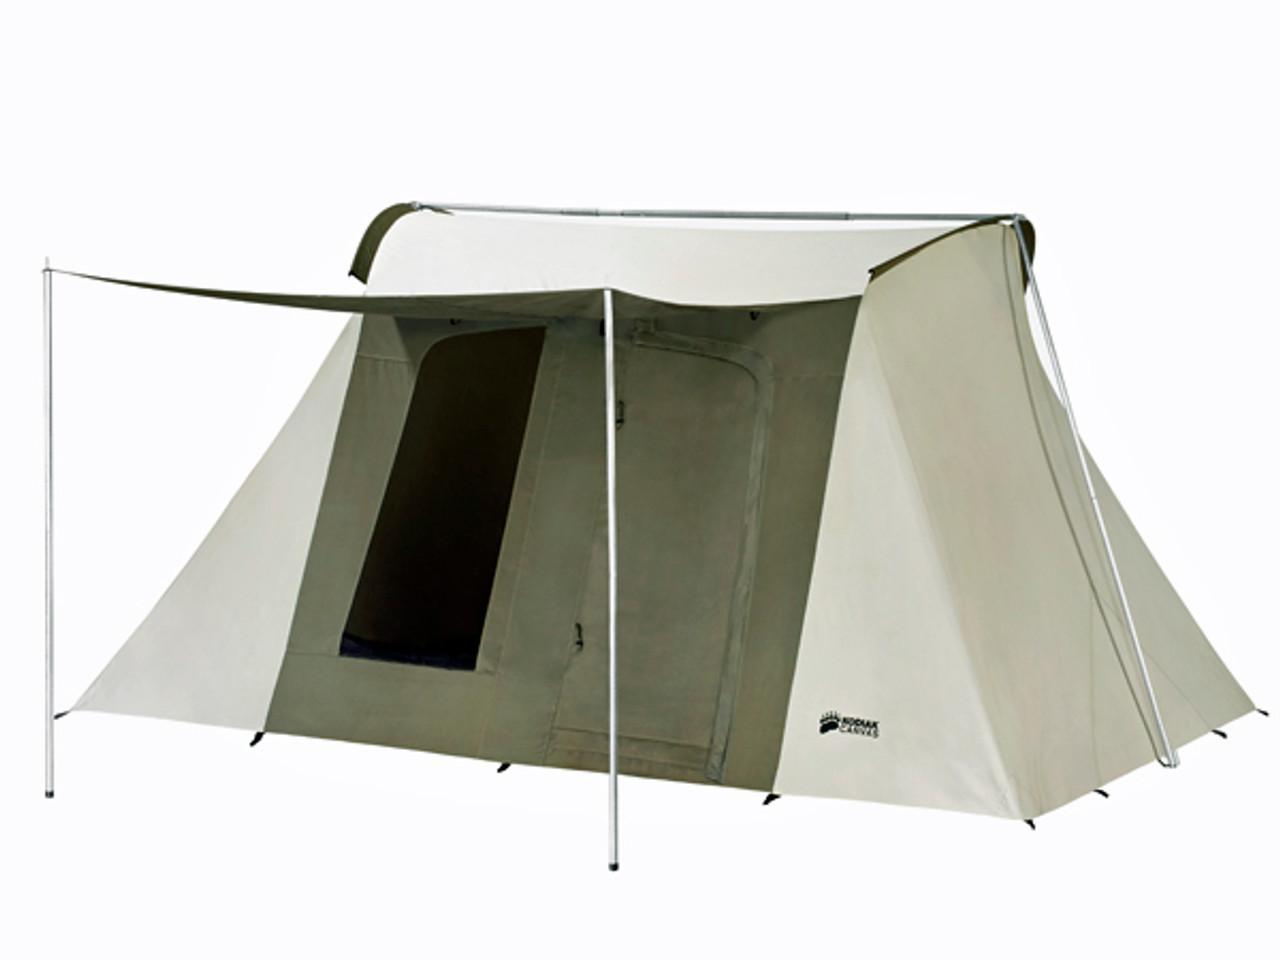 Tent Body 6044 - Estimated Restock Date Nov. 1st, 2021